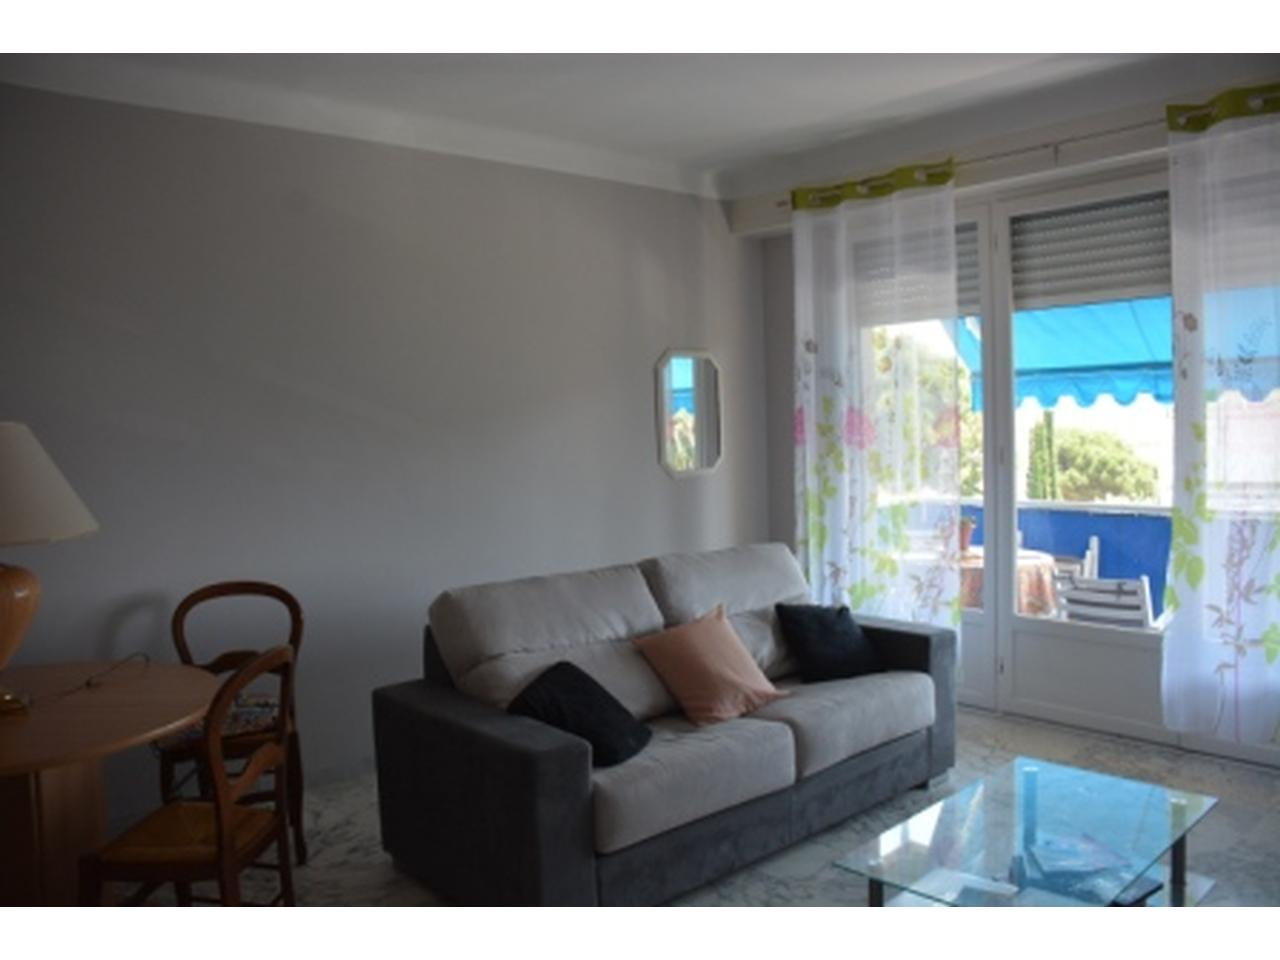 immobilier nice vue mer appartement nice studio meuble avec apercu mer a vendre nice ouest lanterne. Black Bedroom Furniture Sets. Home Design Ideas